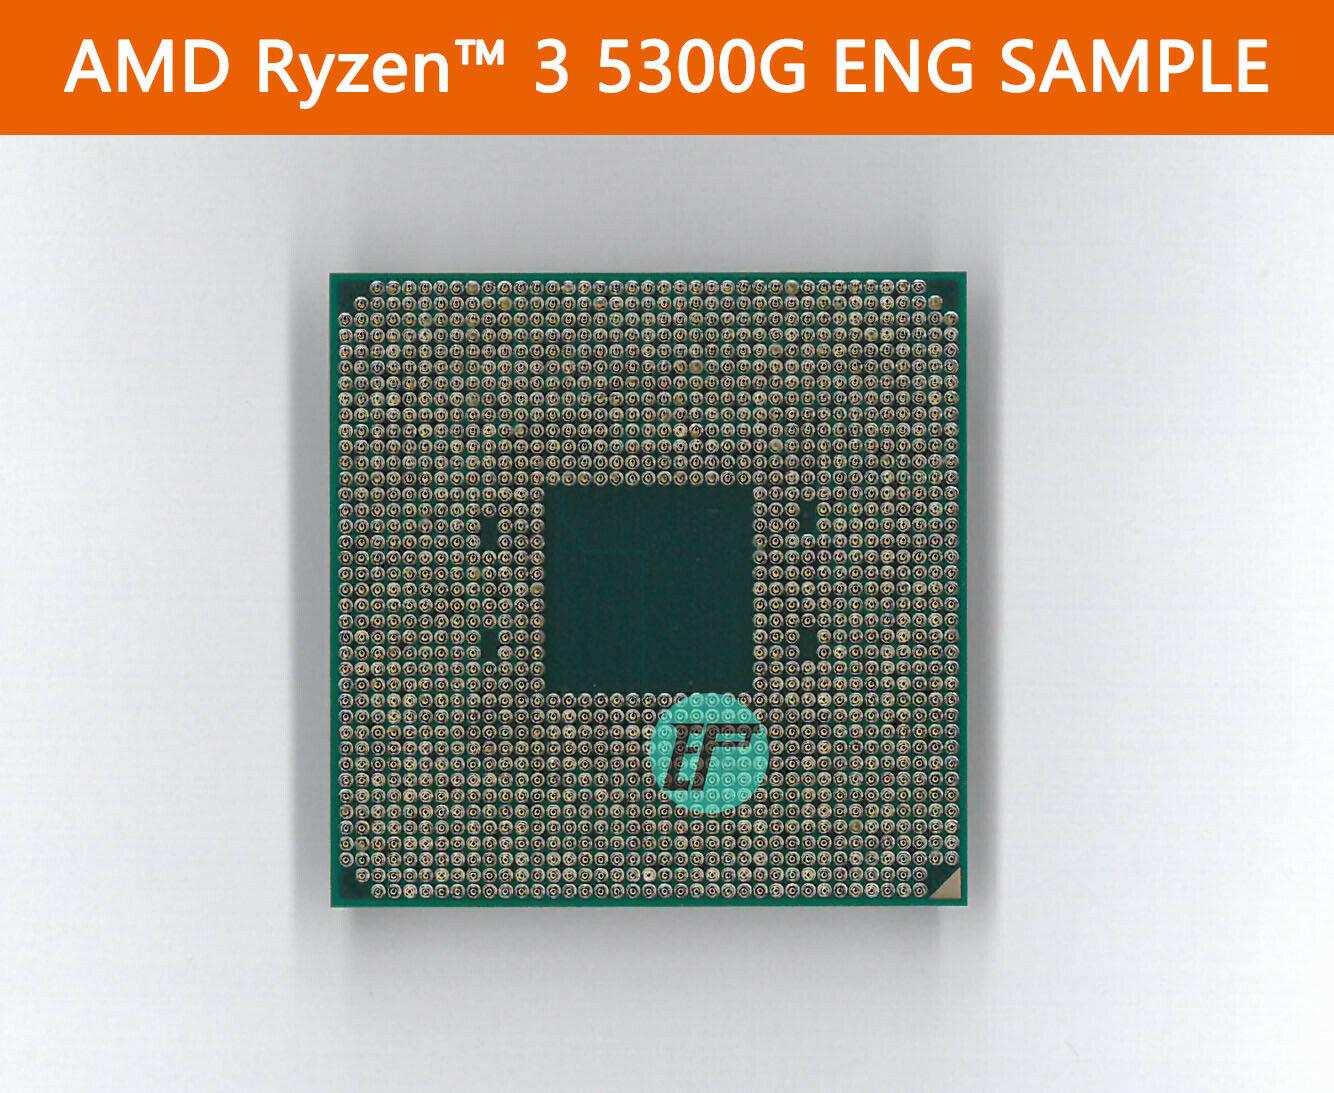 amd-ryzen-5-5300g-4-core-zen-3-desktop-apu-_-benchmarks-_8